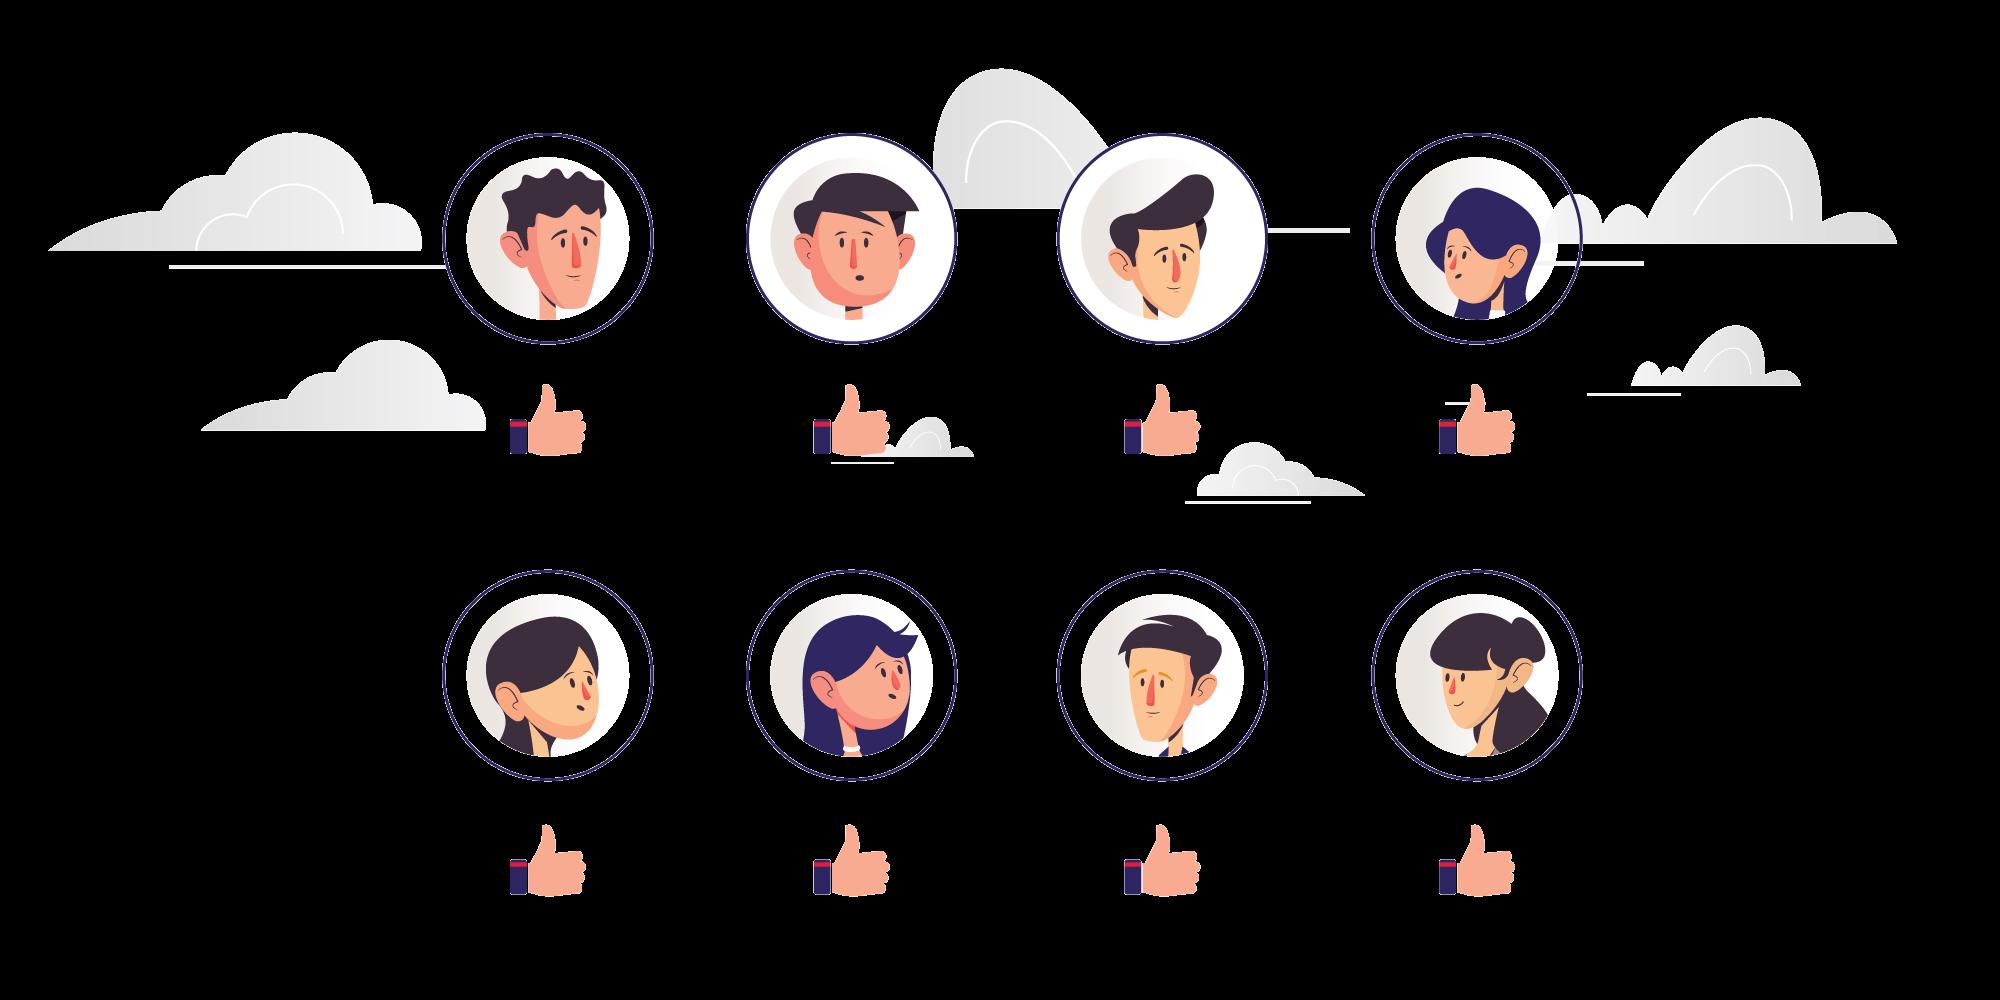 Eight illustrated portraits